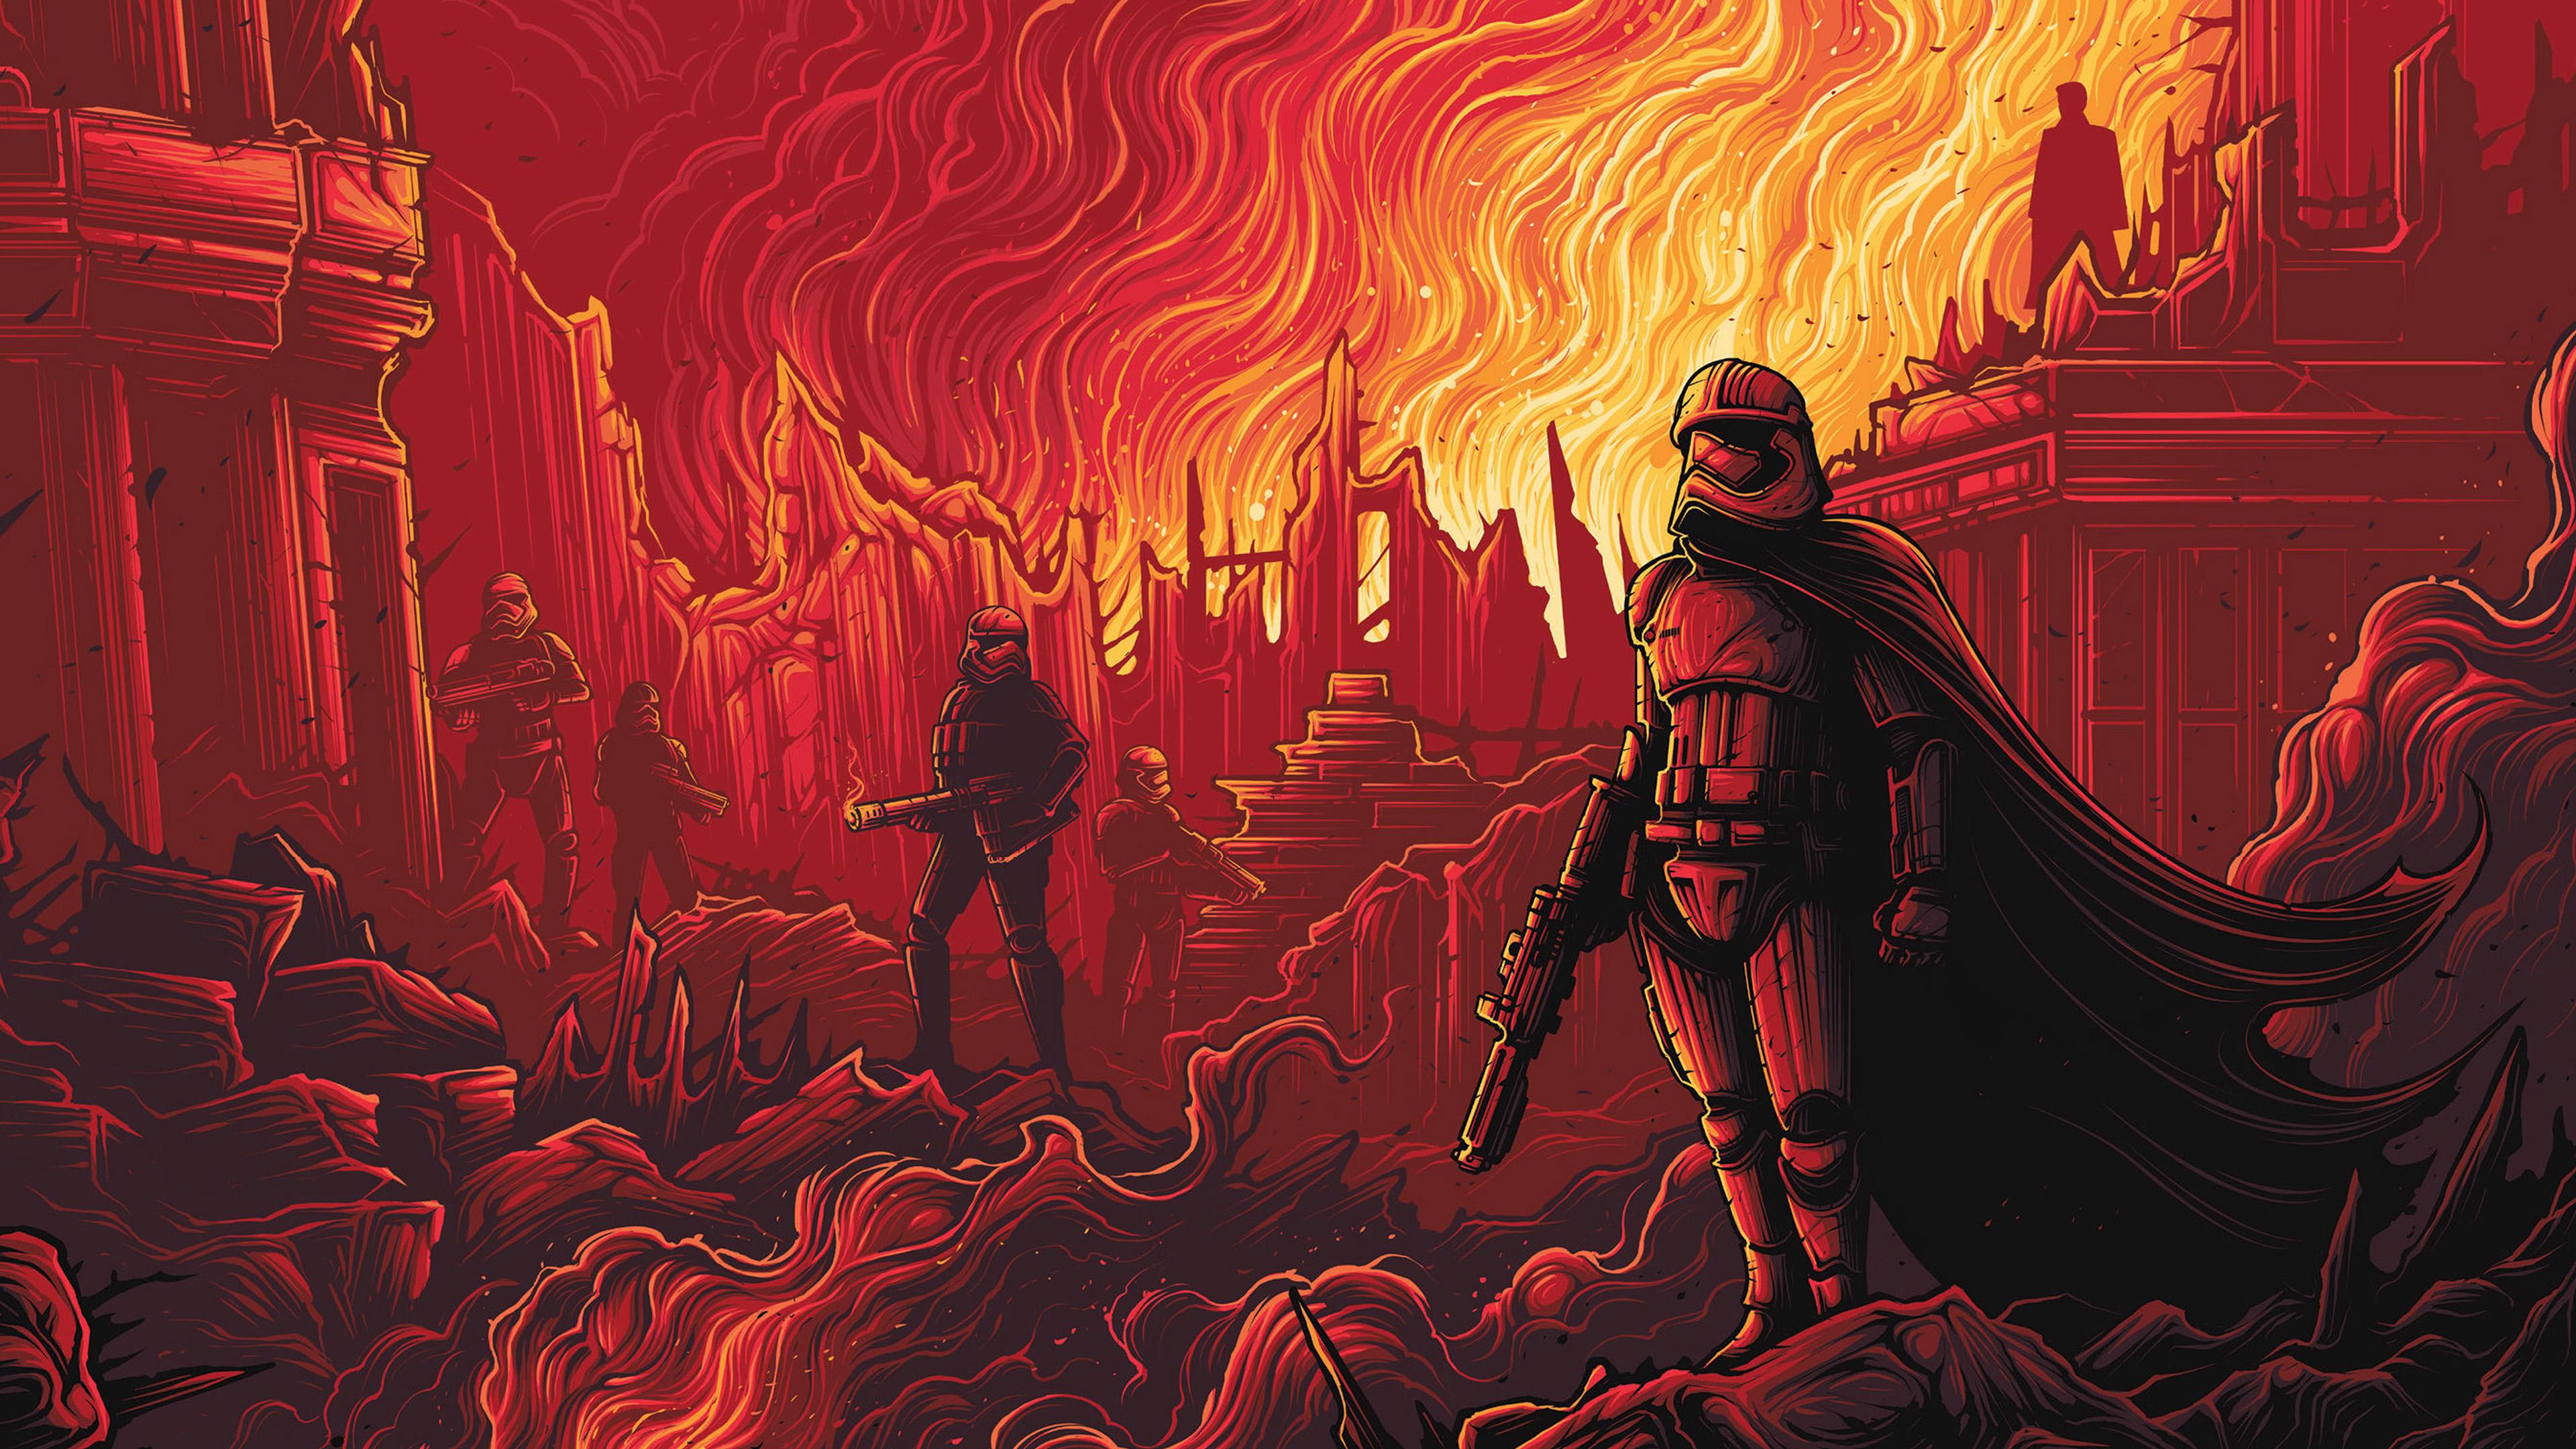 Ap11 Captain Phasma Starwars Red Film Art Wallpaper